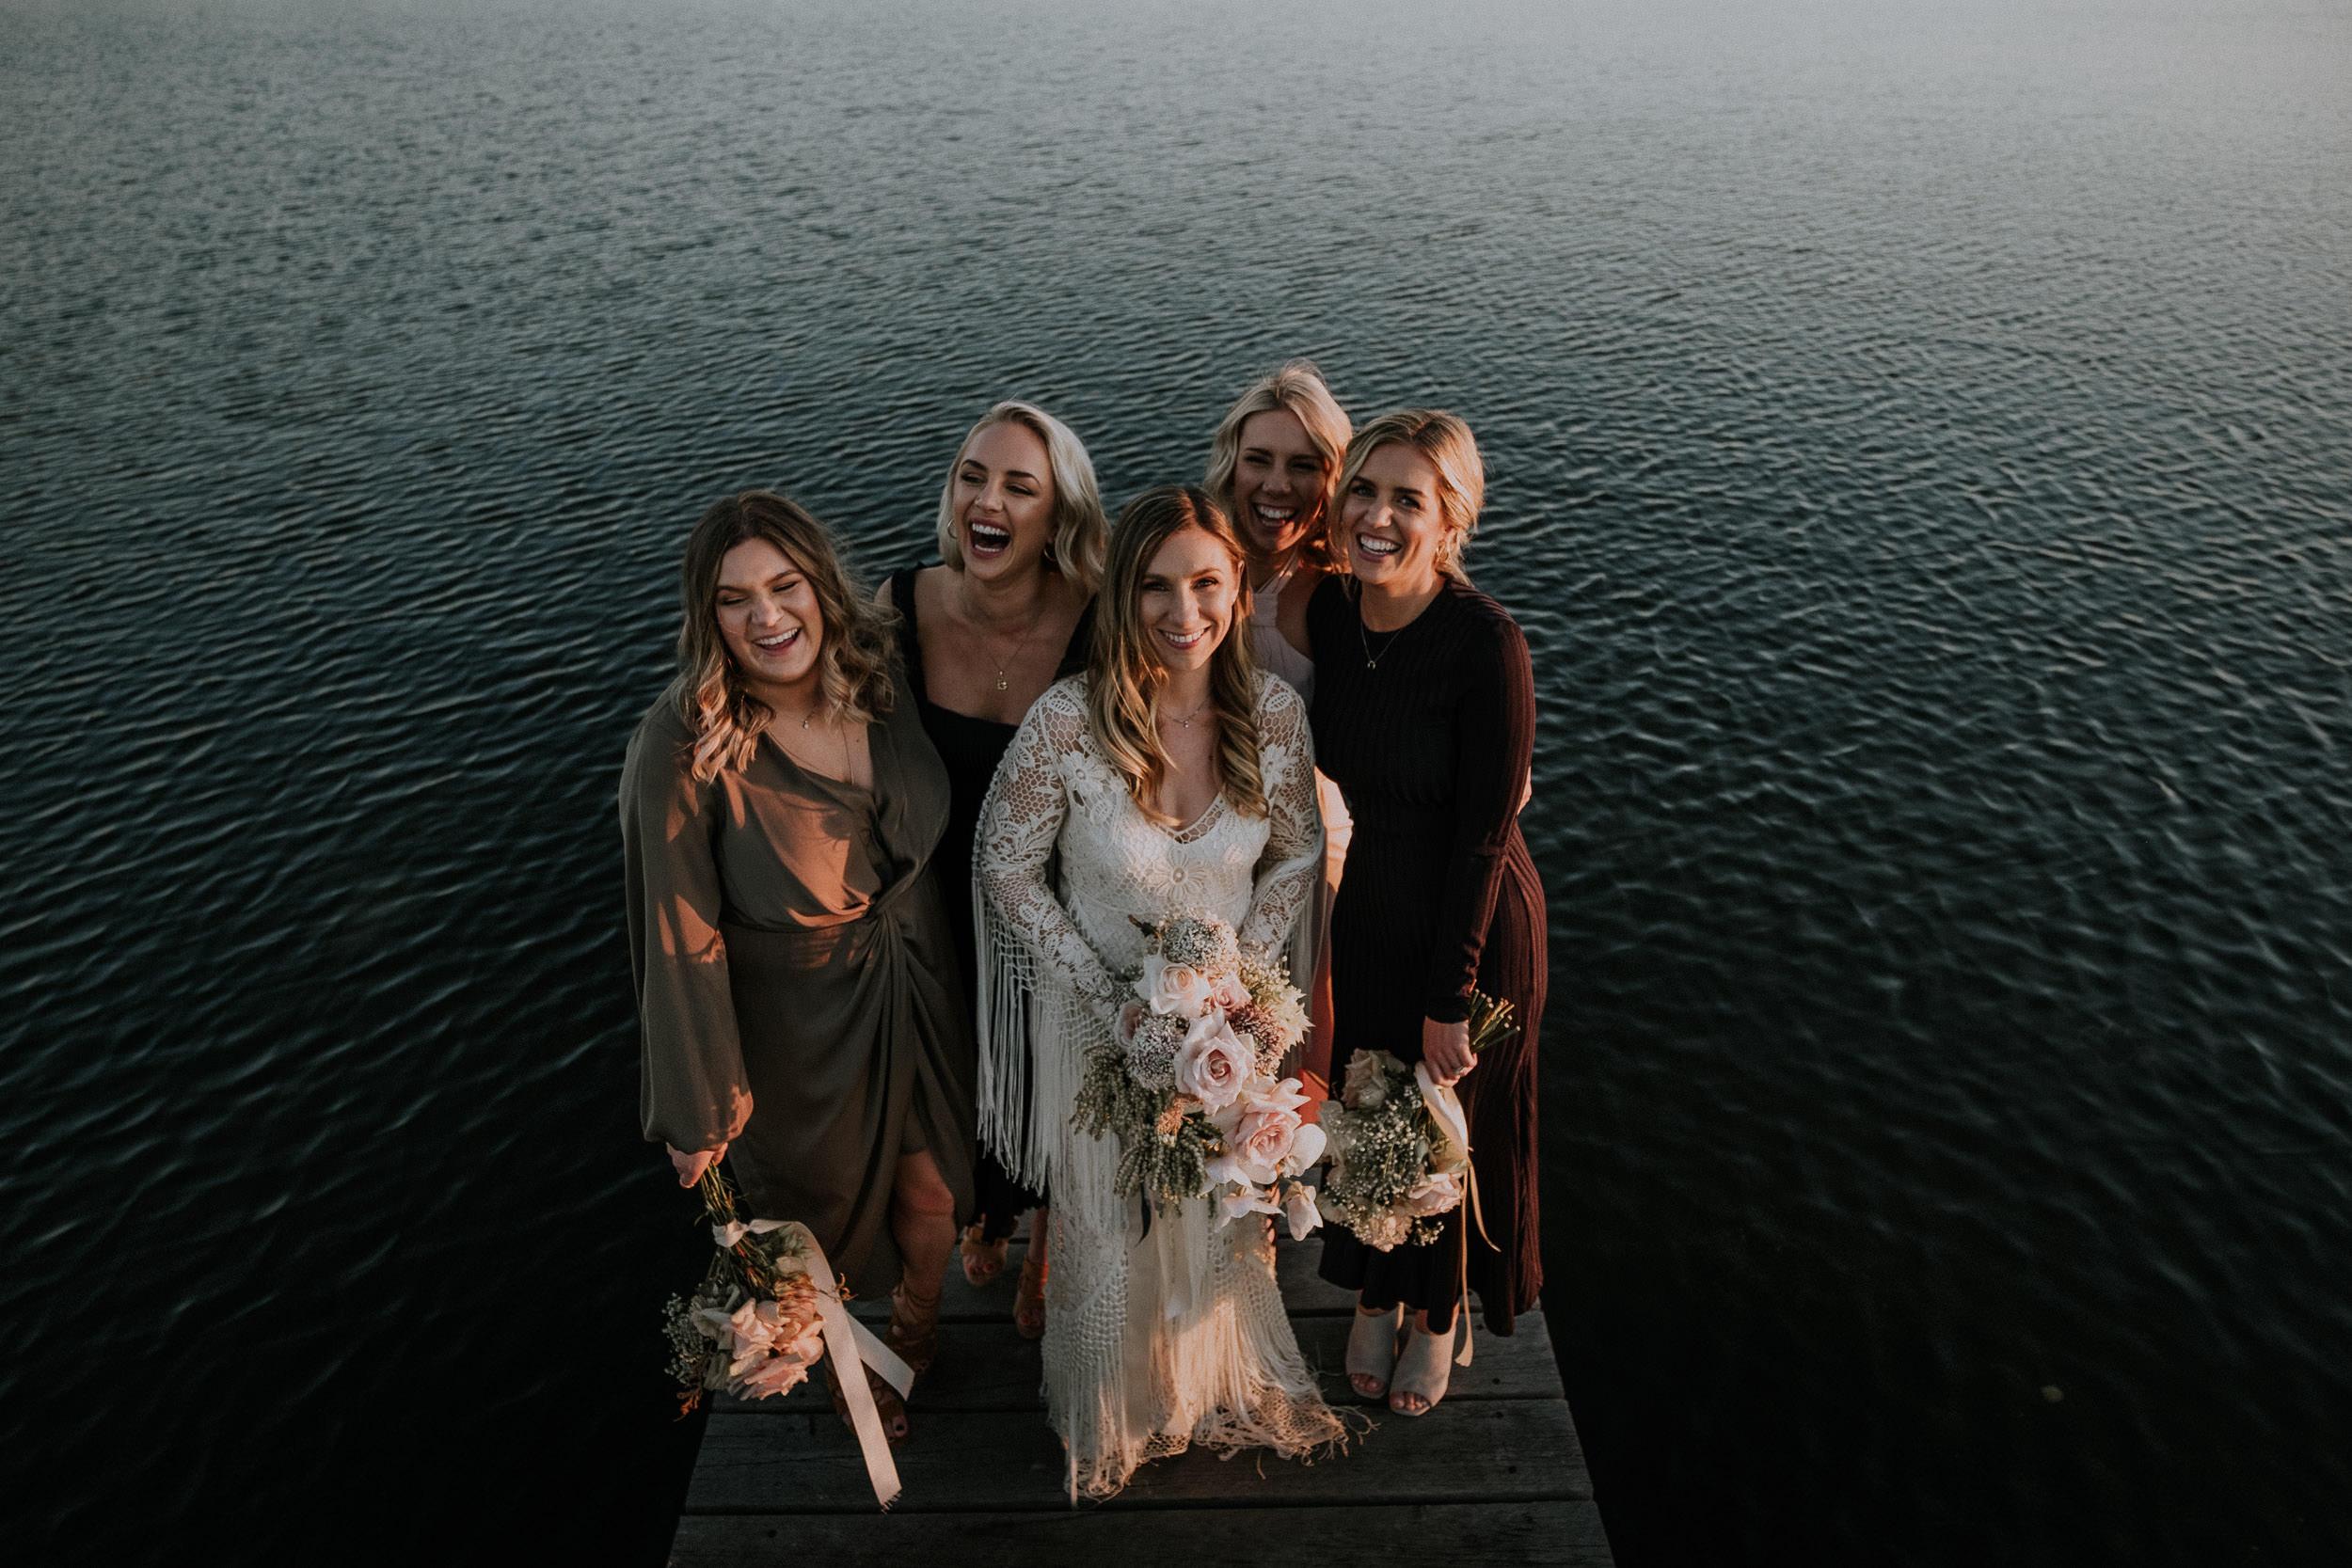 S&A Elopement - Kings & Thieves - Shred 'Til Dead - Central Coast Beach Forest Wedding - 372.jpg